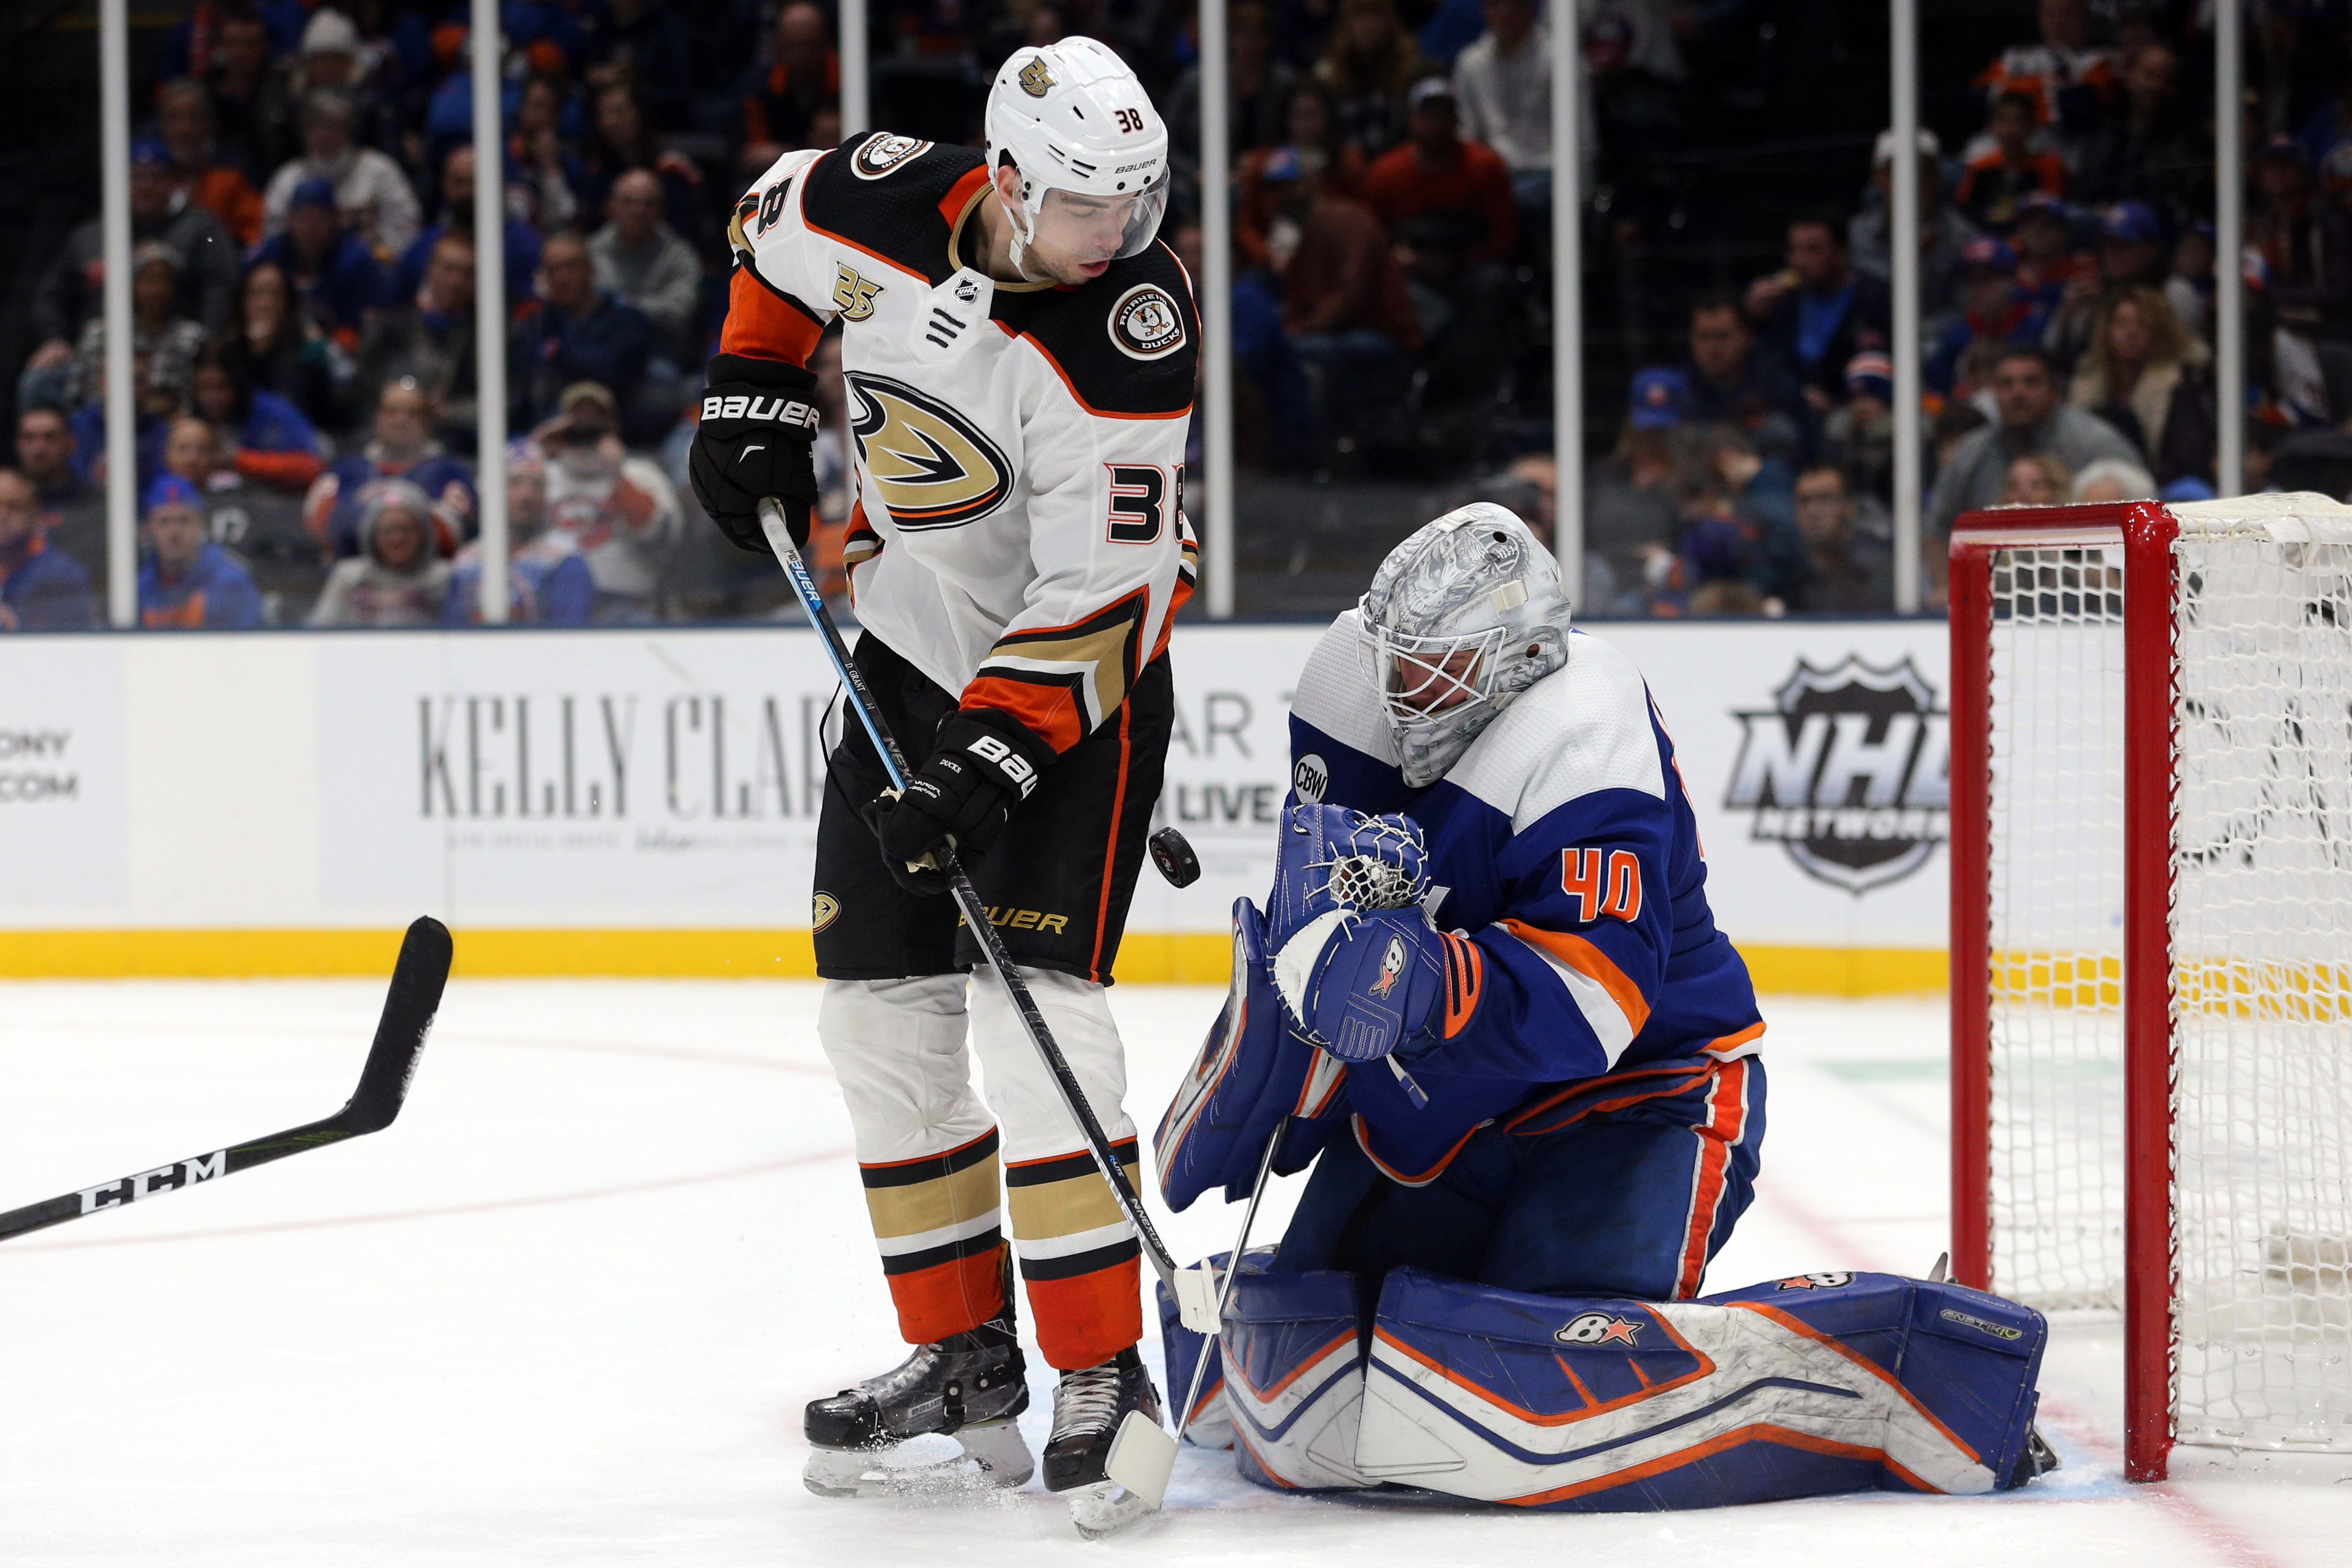 Jan 20, 2019; Uniondale, NY, USA; New York Islanders goalie Robin Lehner (40) makes a save against Anaheim Ducks center Derek Grant (38) during the third period at Nassau Veterans Memorial Coliseum.